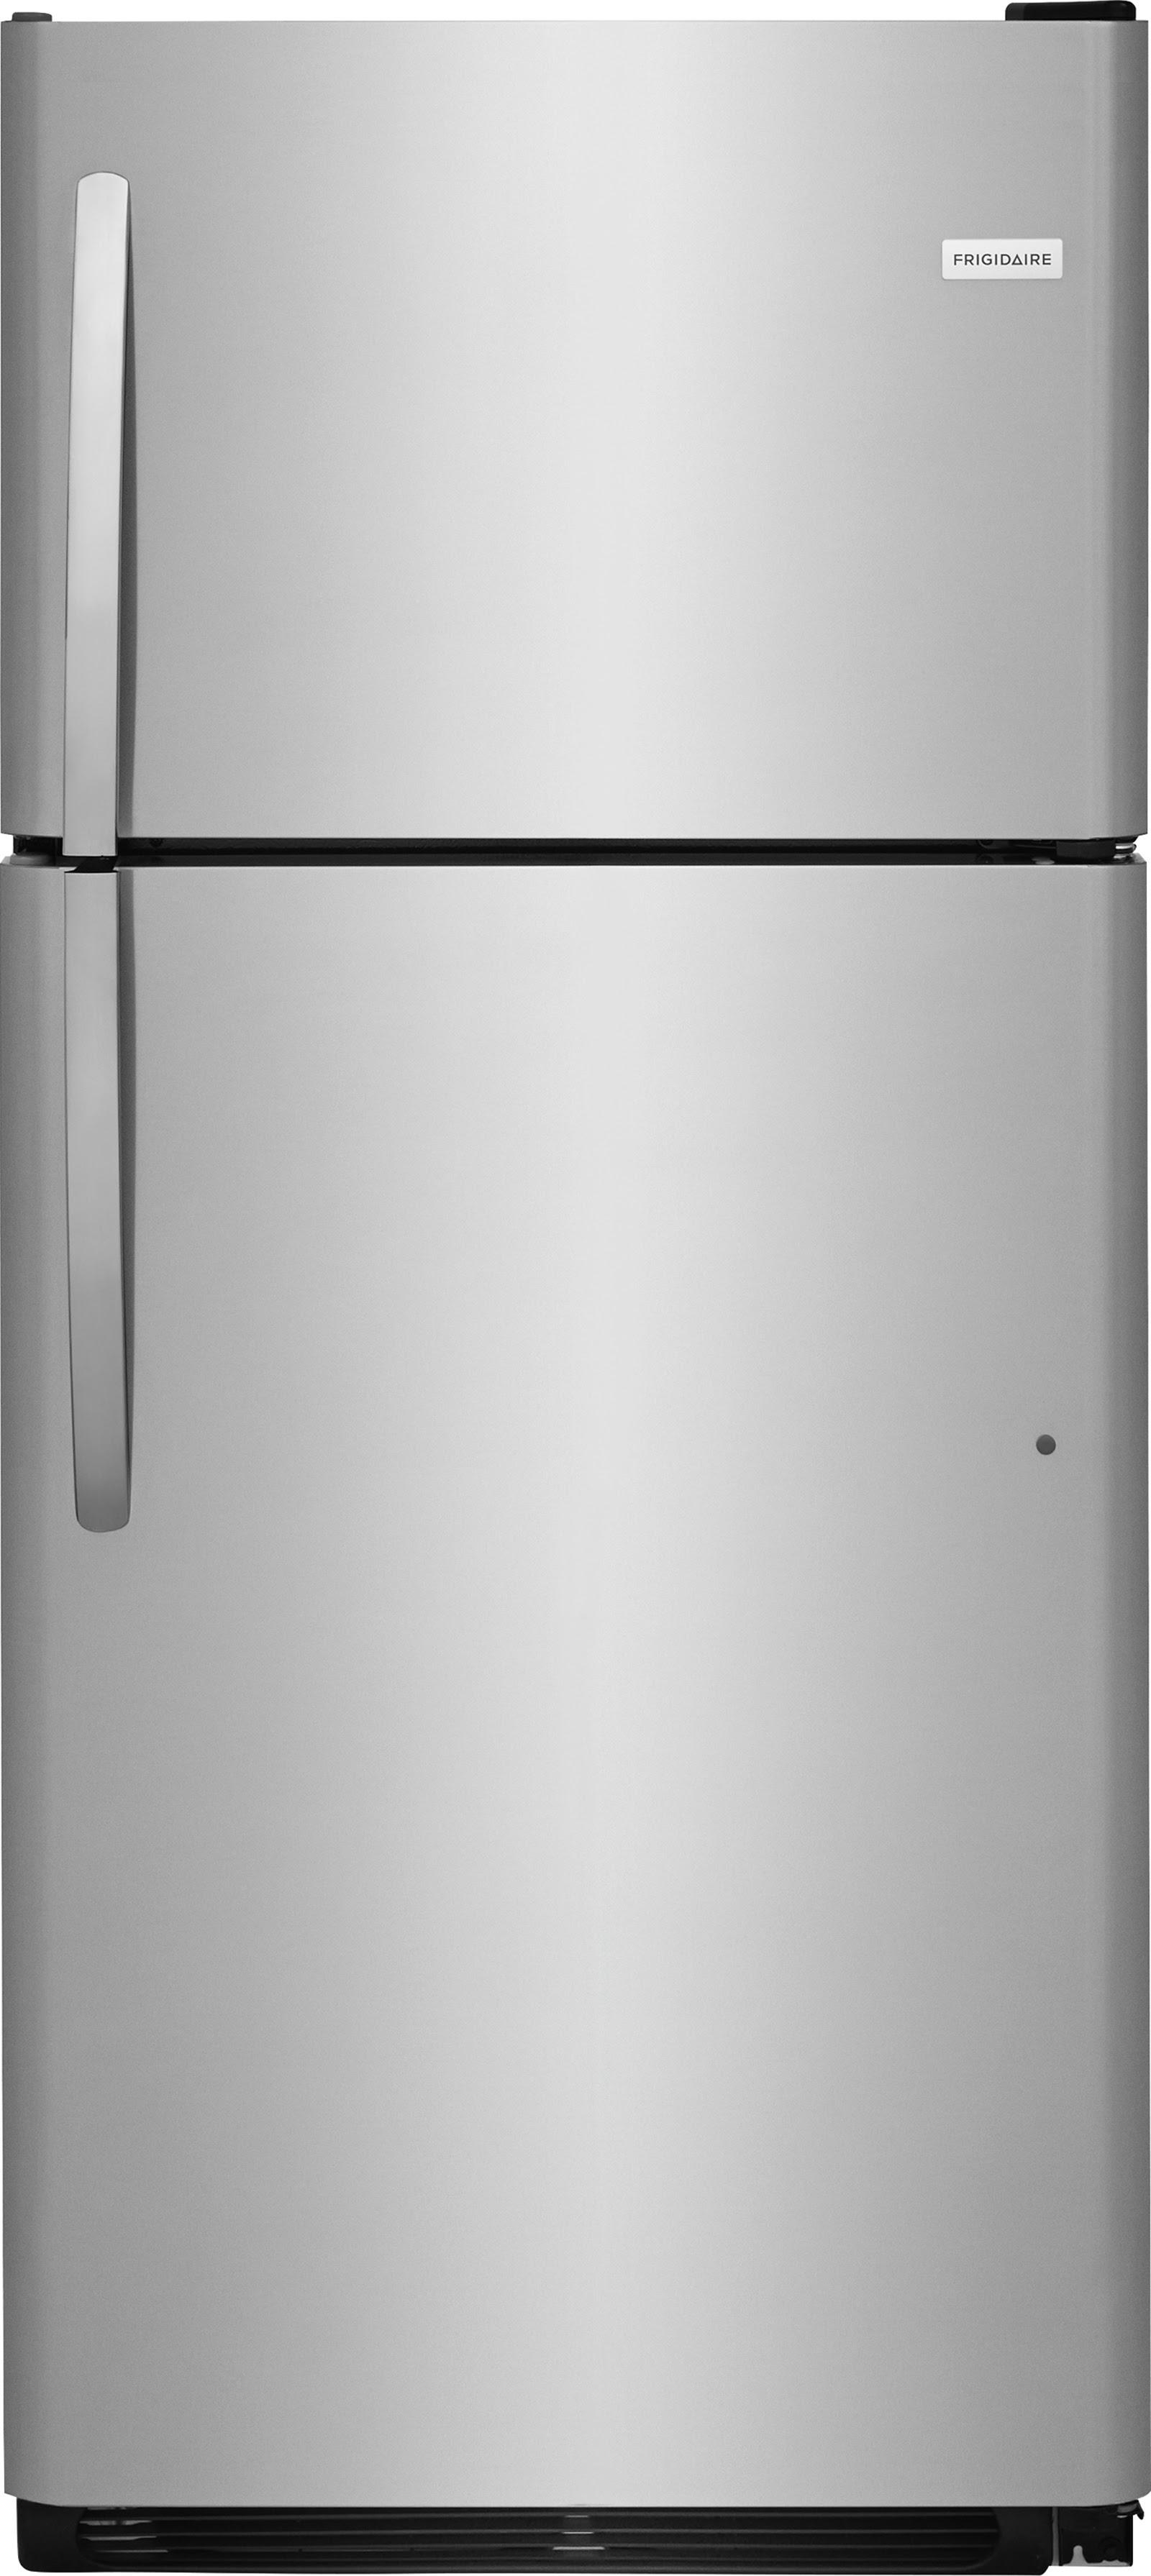 Frigidaire FFTR2021TS 20 4 cu ft Top Freezer Refrigerator